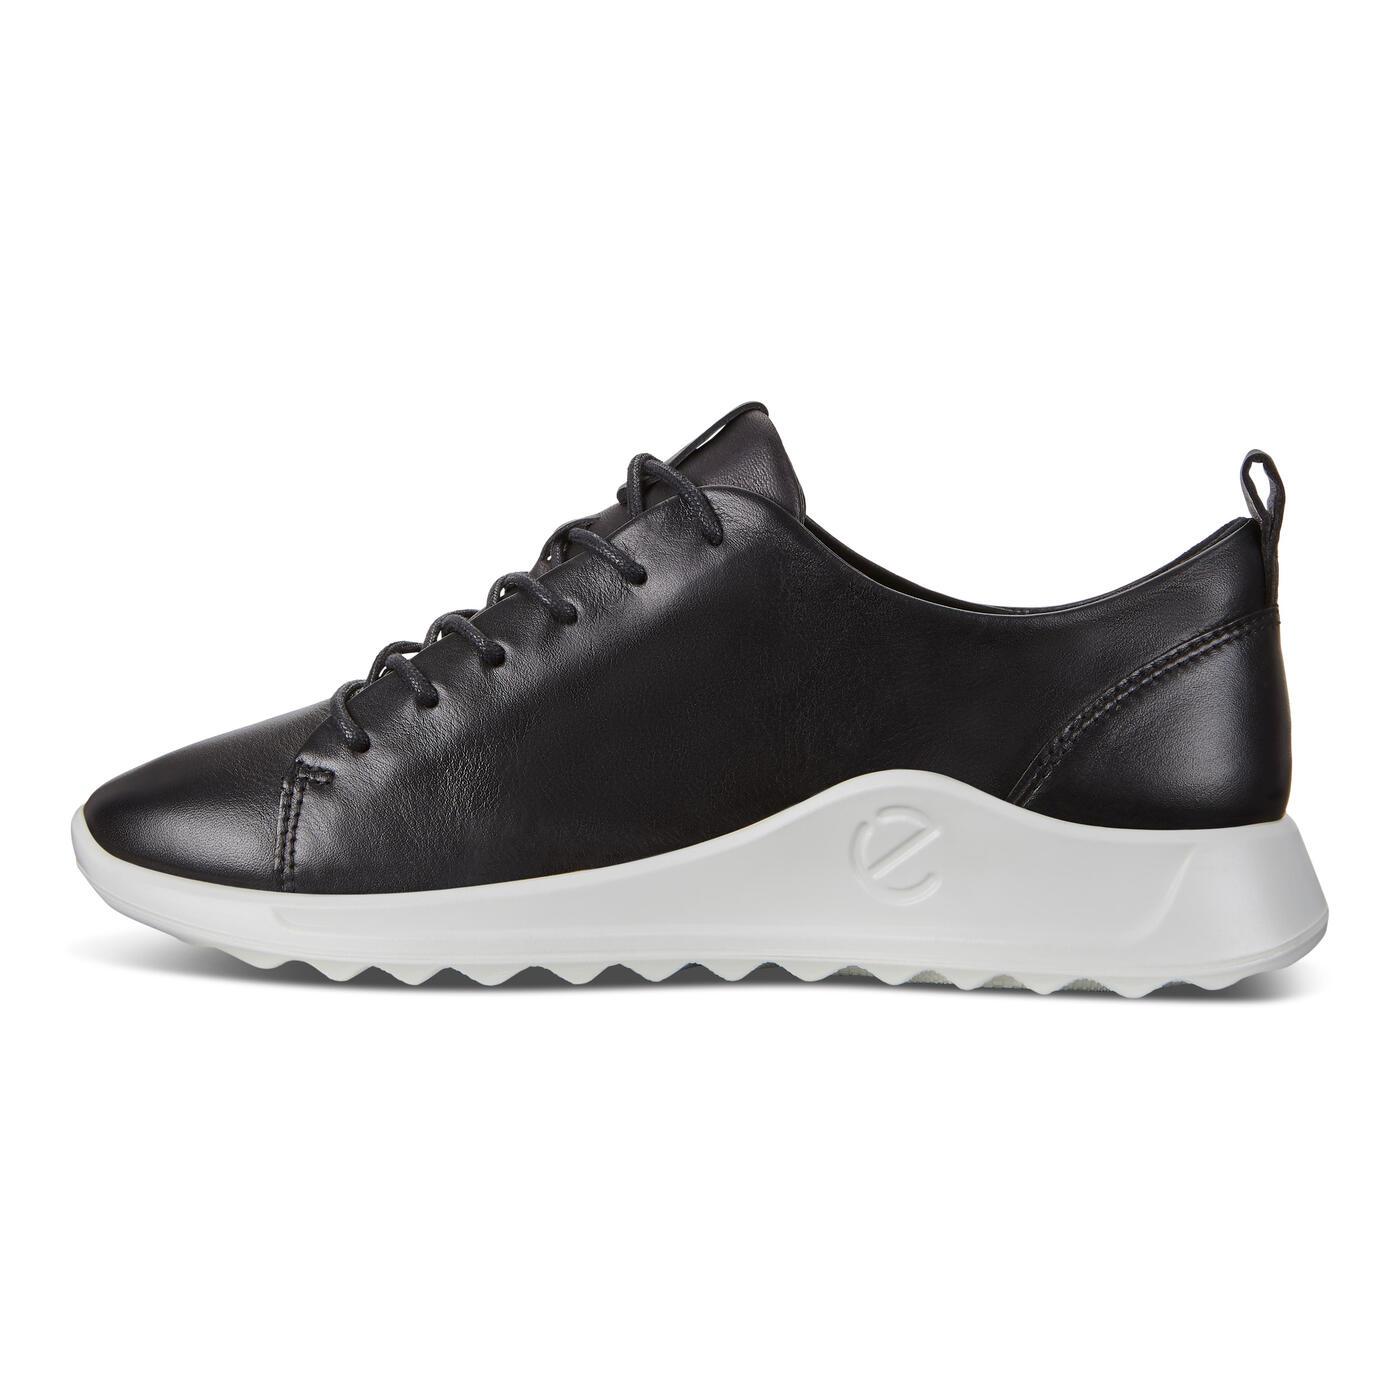 ECCO Flexure Runner Women's Shoes